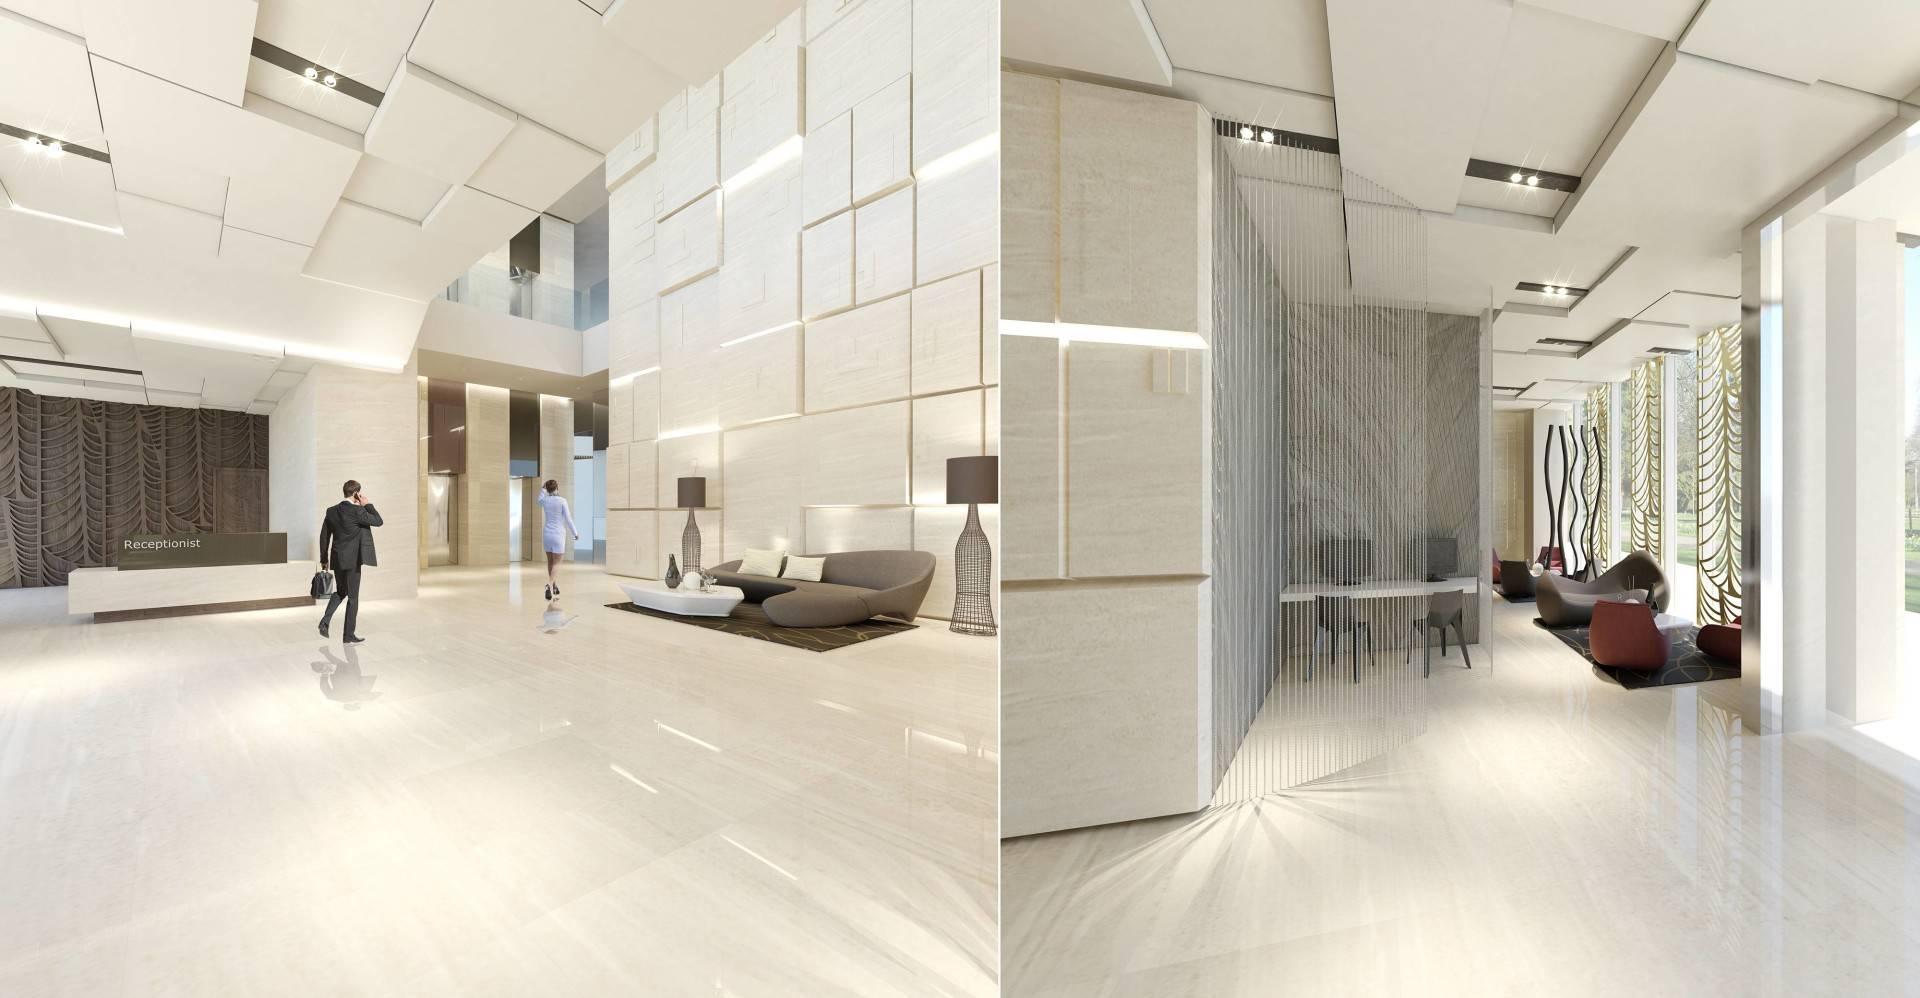 Small Space Interior Sudirman Hill  Jakarta, Indonesia Jakarta, Indonesia Lobby-Apartment2   6470